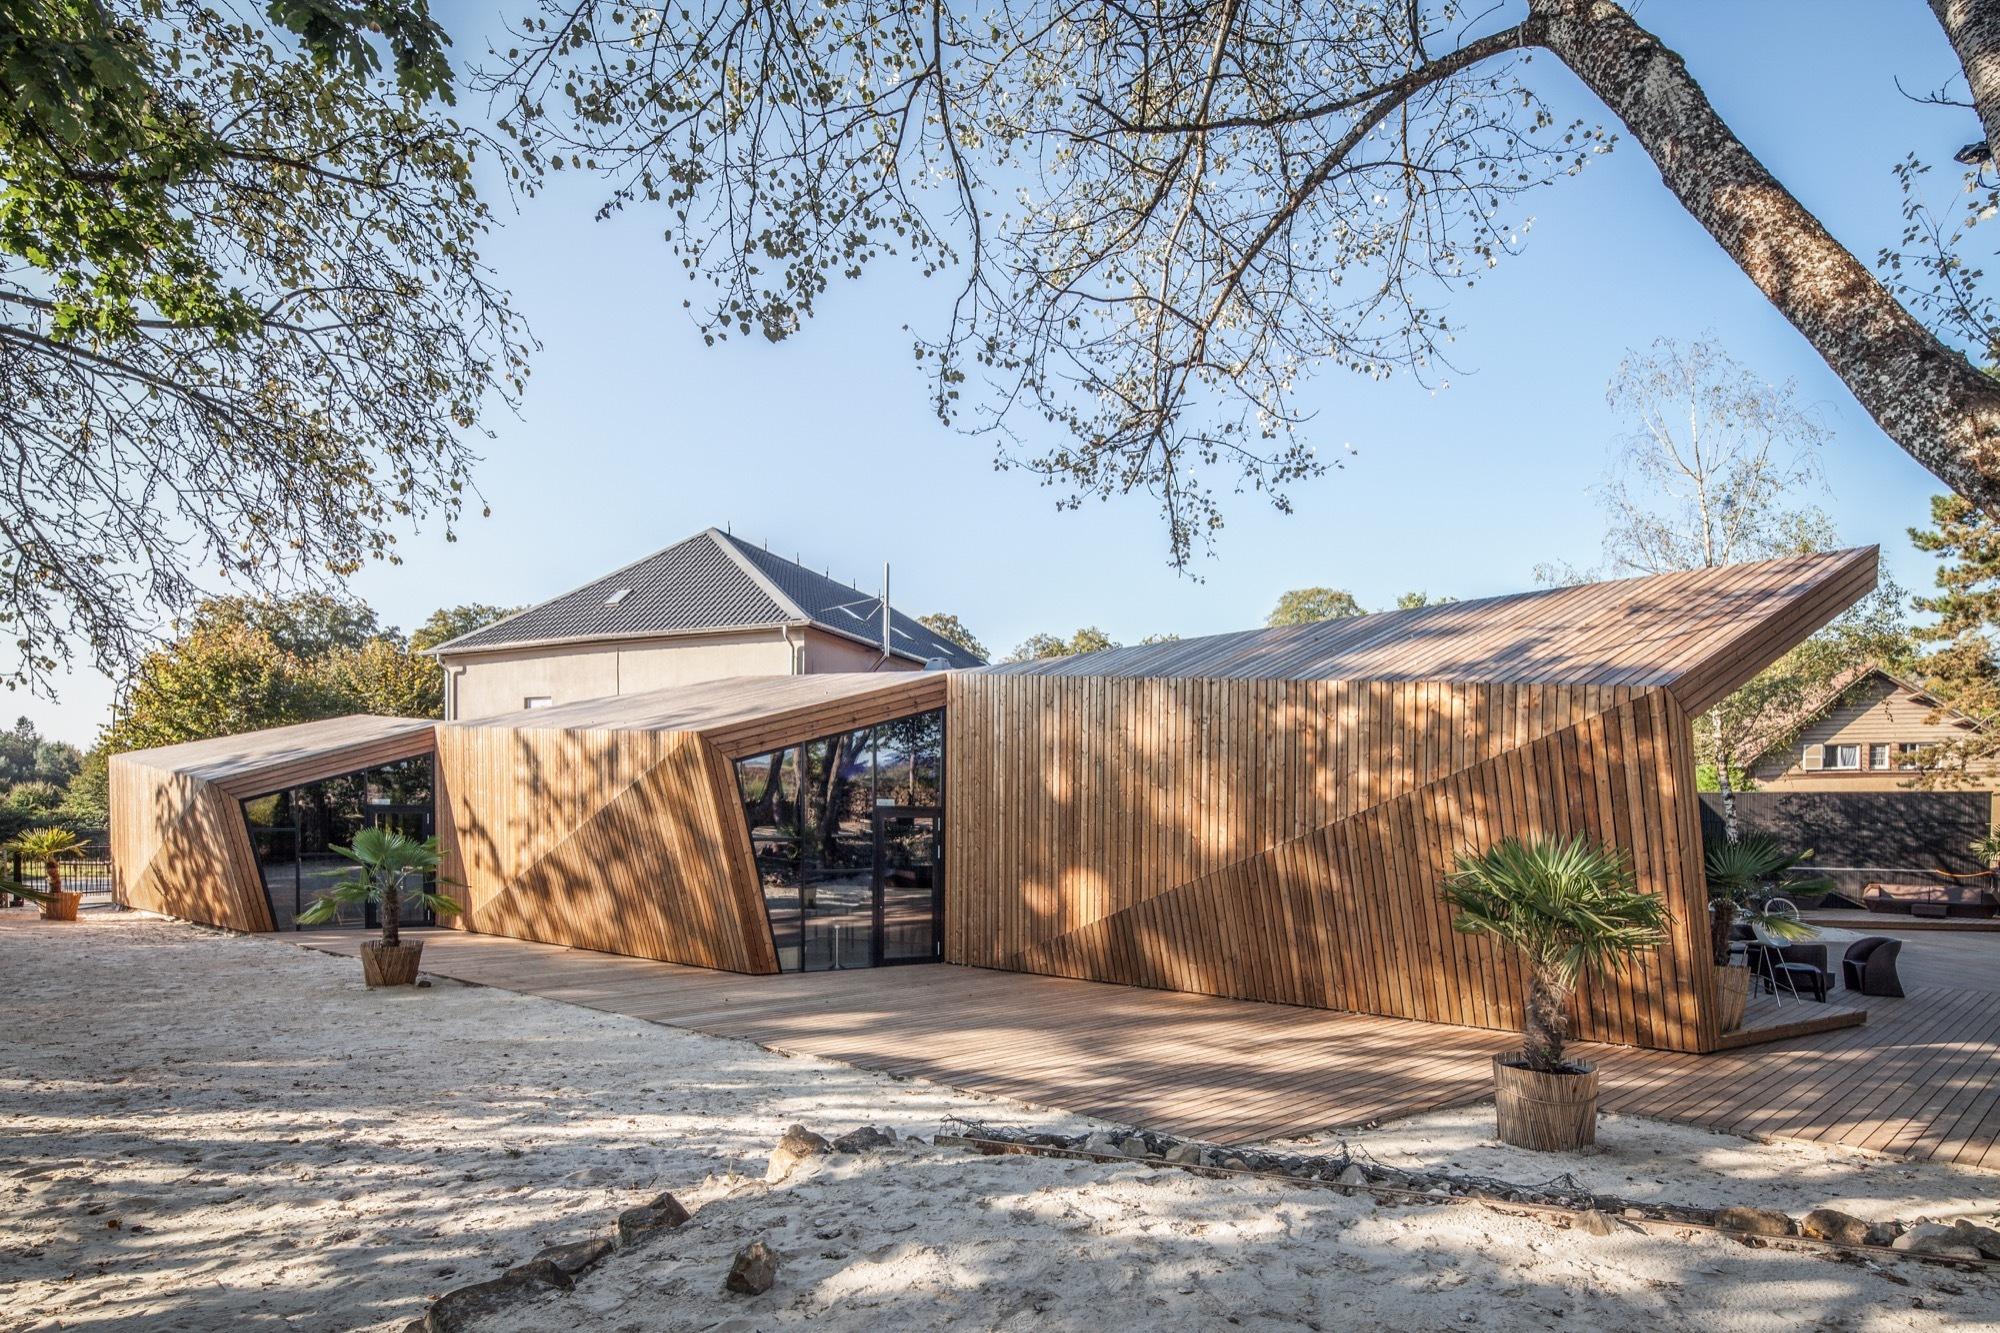 Restaurante Boos Beach Club Metaform Architects Archdaily Peru